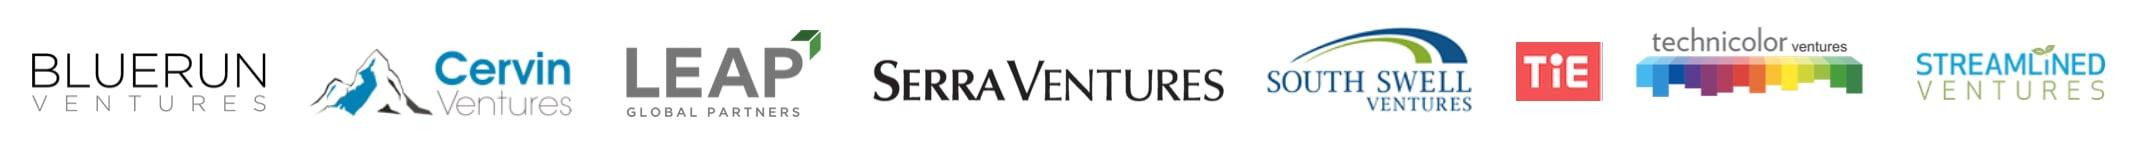 paystand_investor_logos